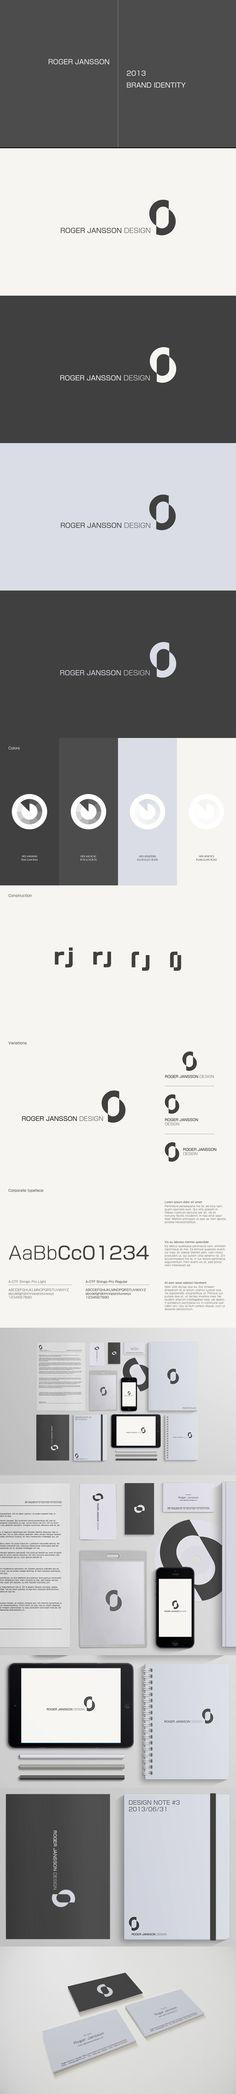 Brand identity - Roger Jansson